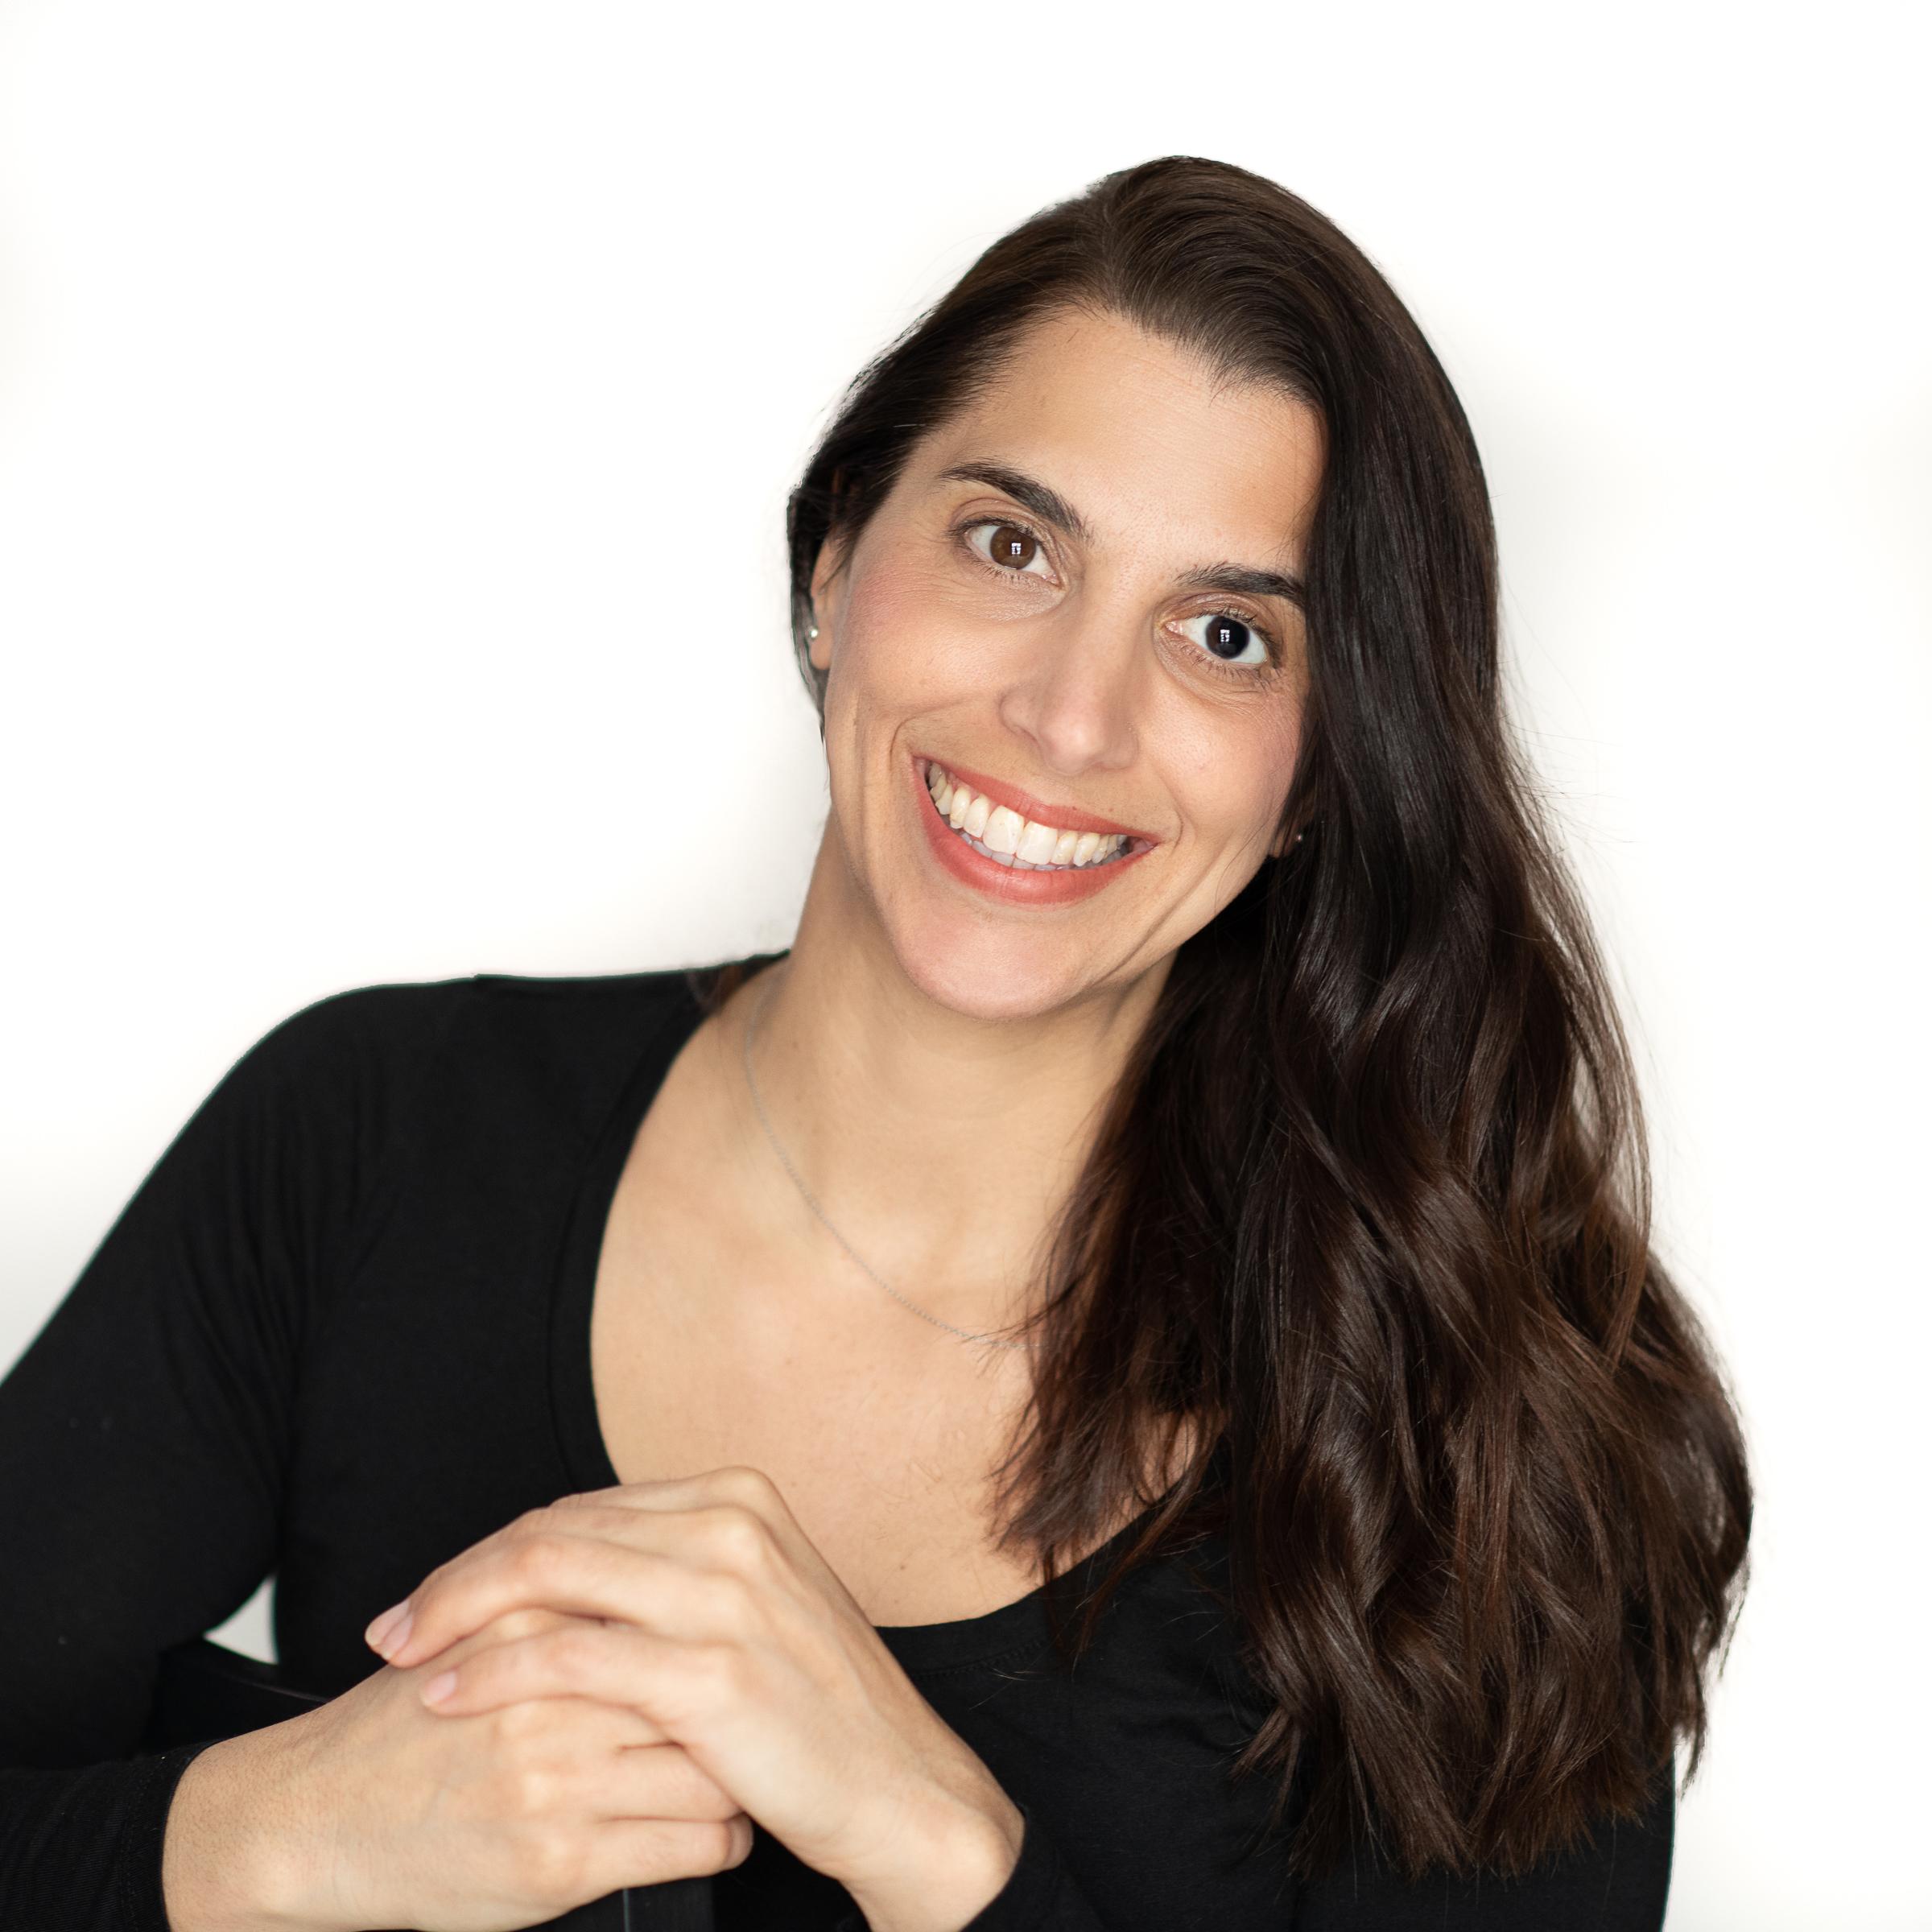 Portrait of Kristen Russo